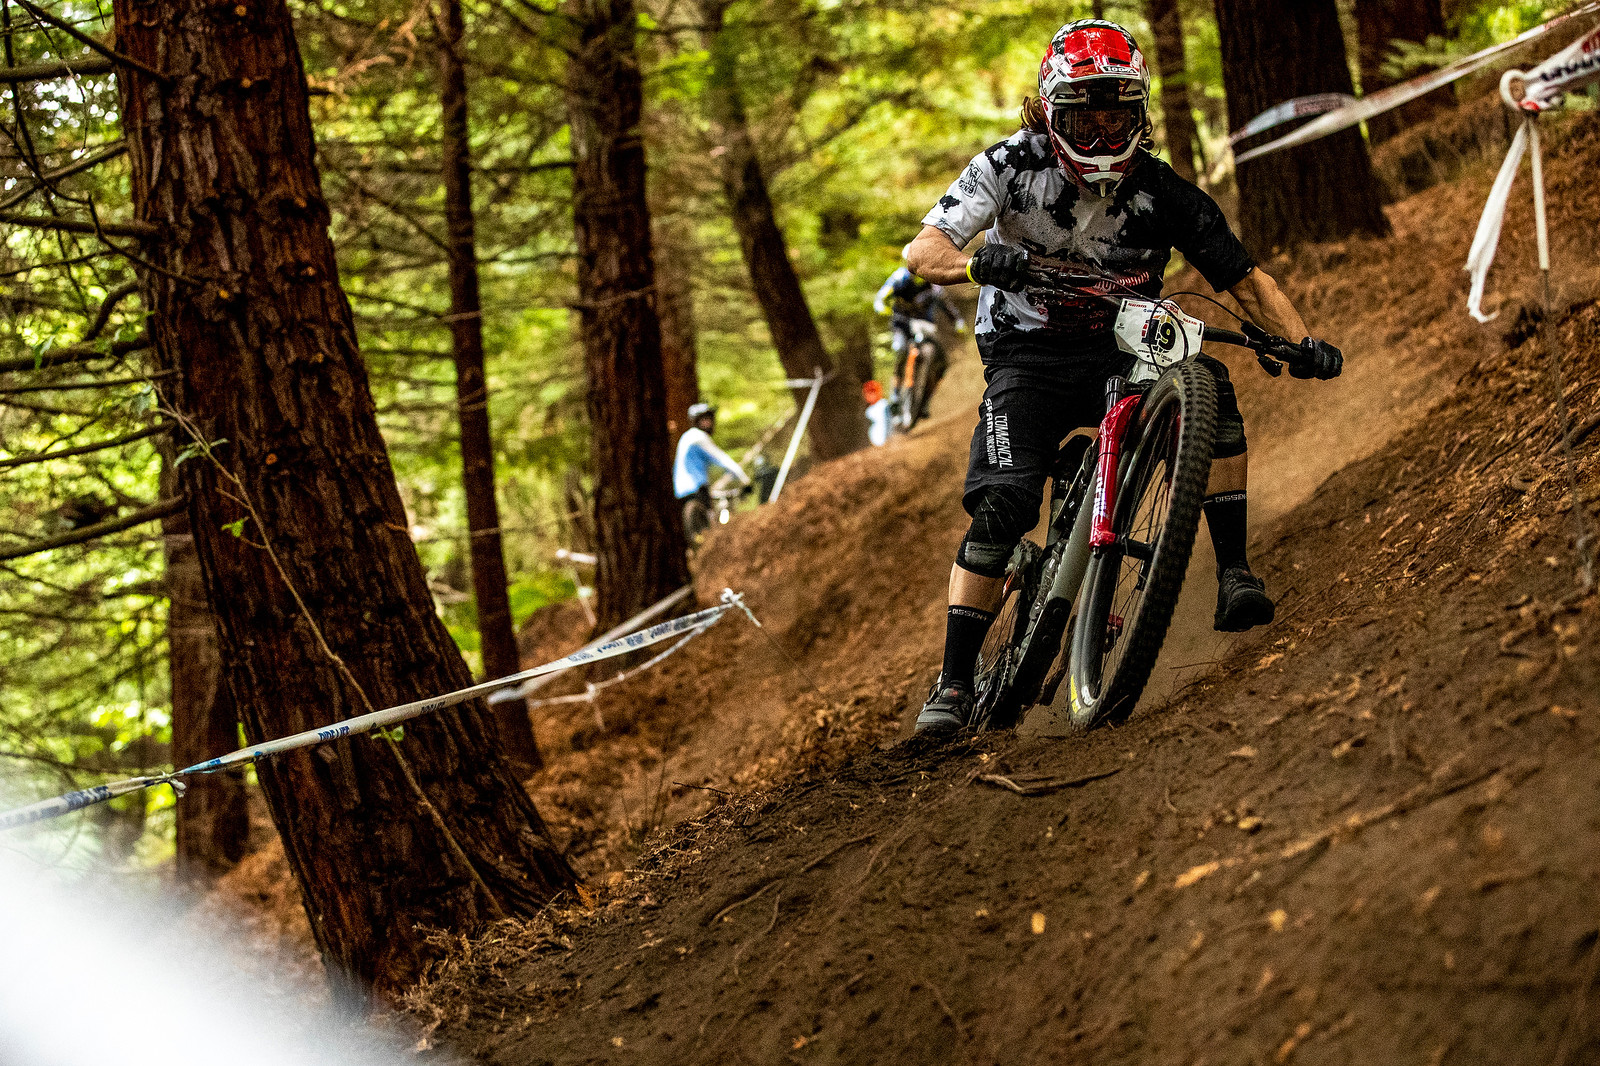 Yoann Barelli - 2019 Enduro World Series Crankworx Rotorua - Mountain Biking Pictures - Vital MTB